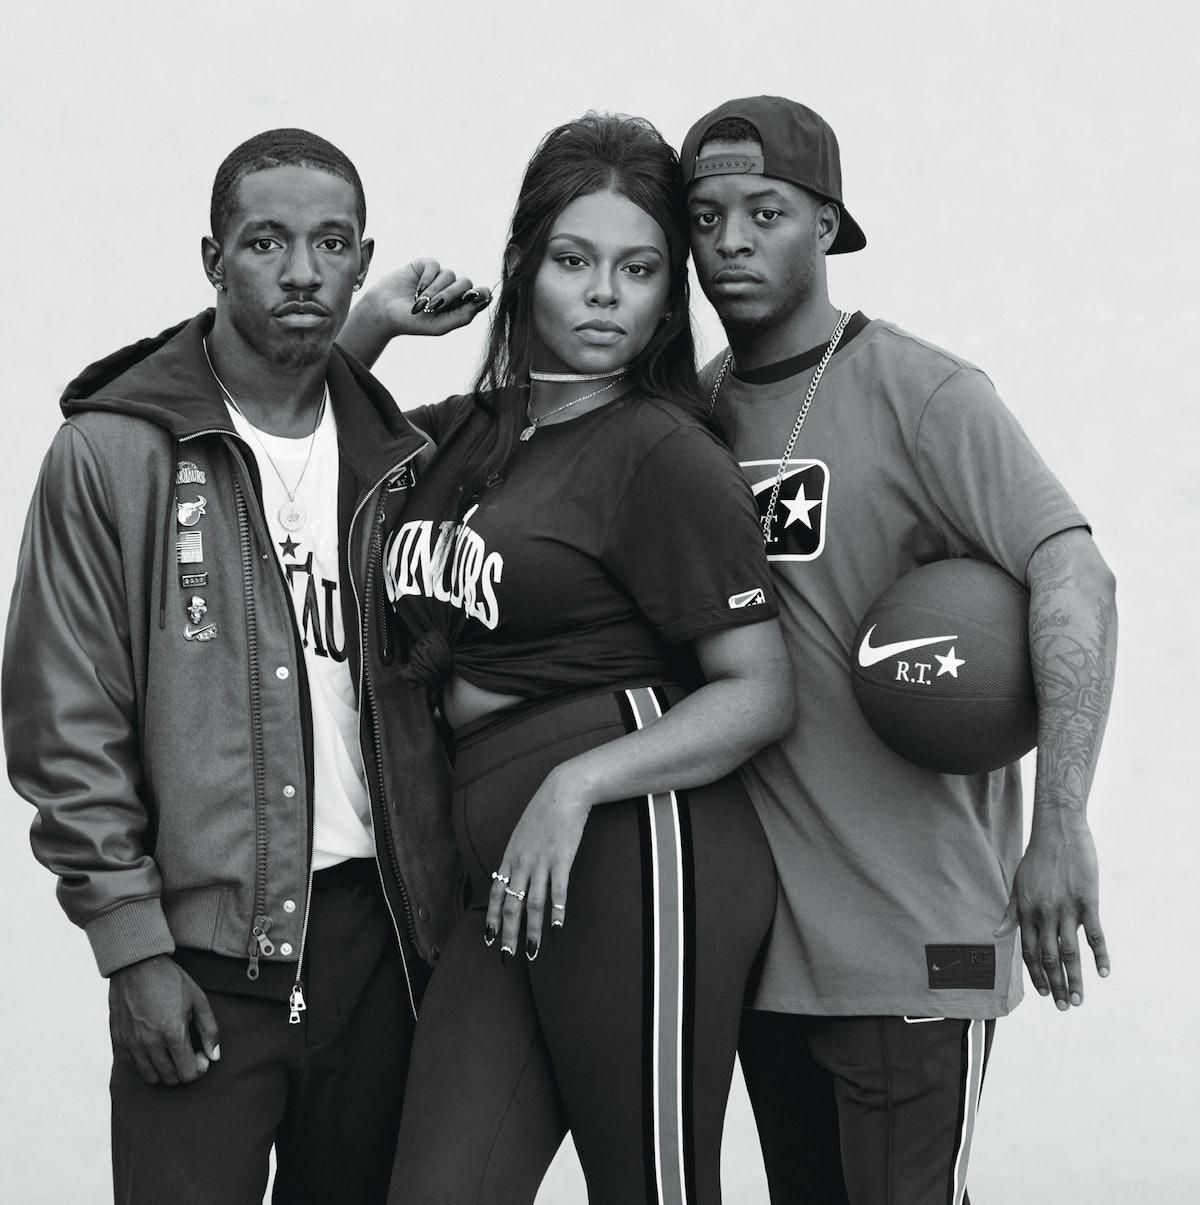 Nike - November 2017 - Dream Team